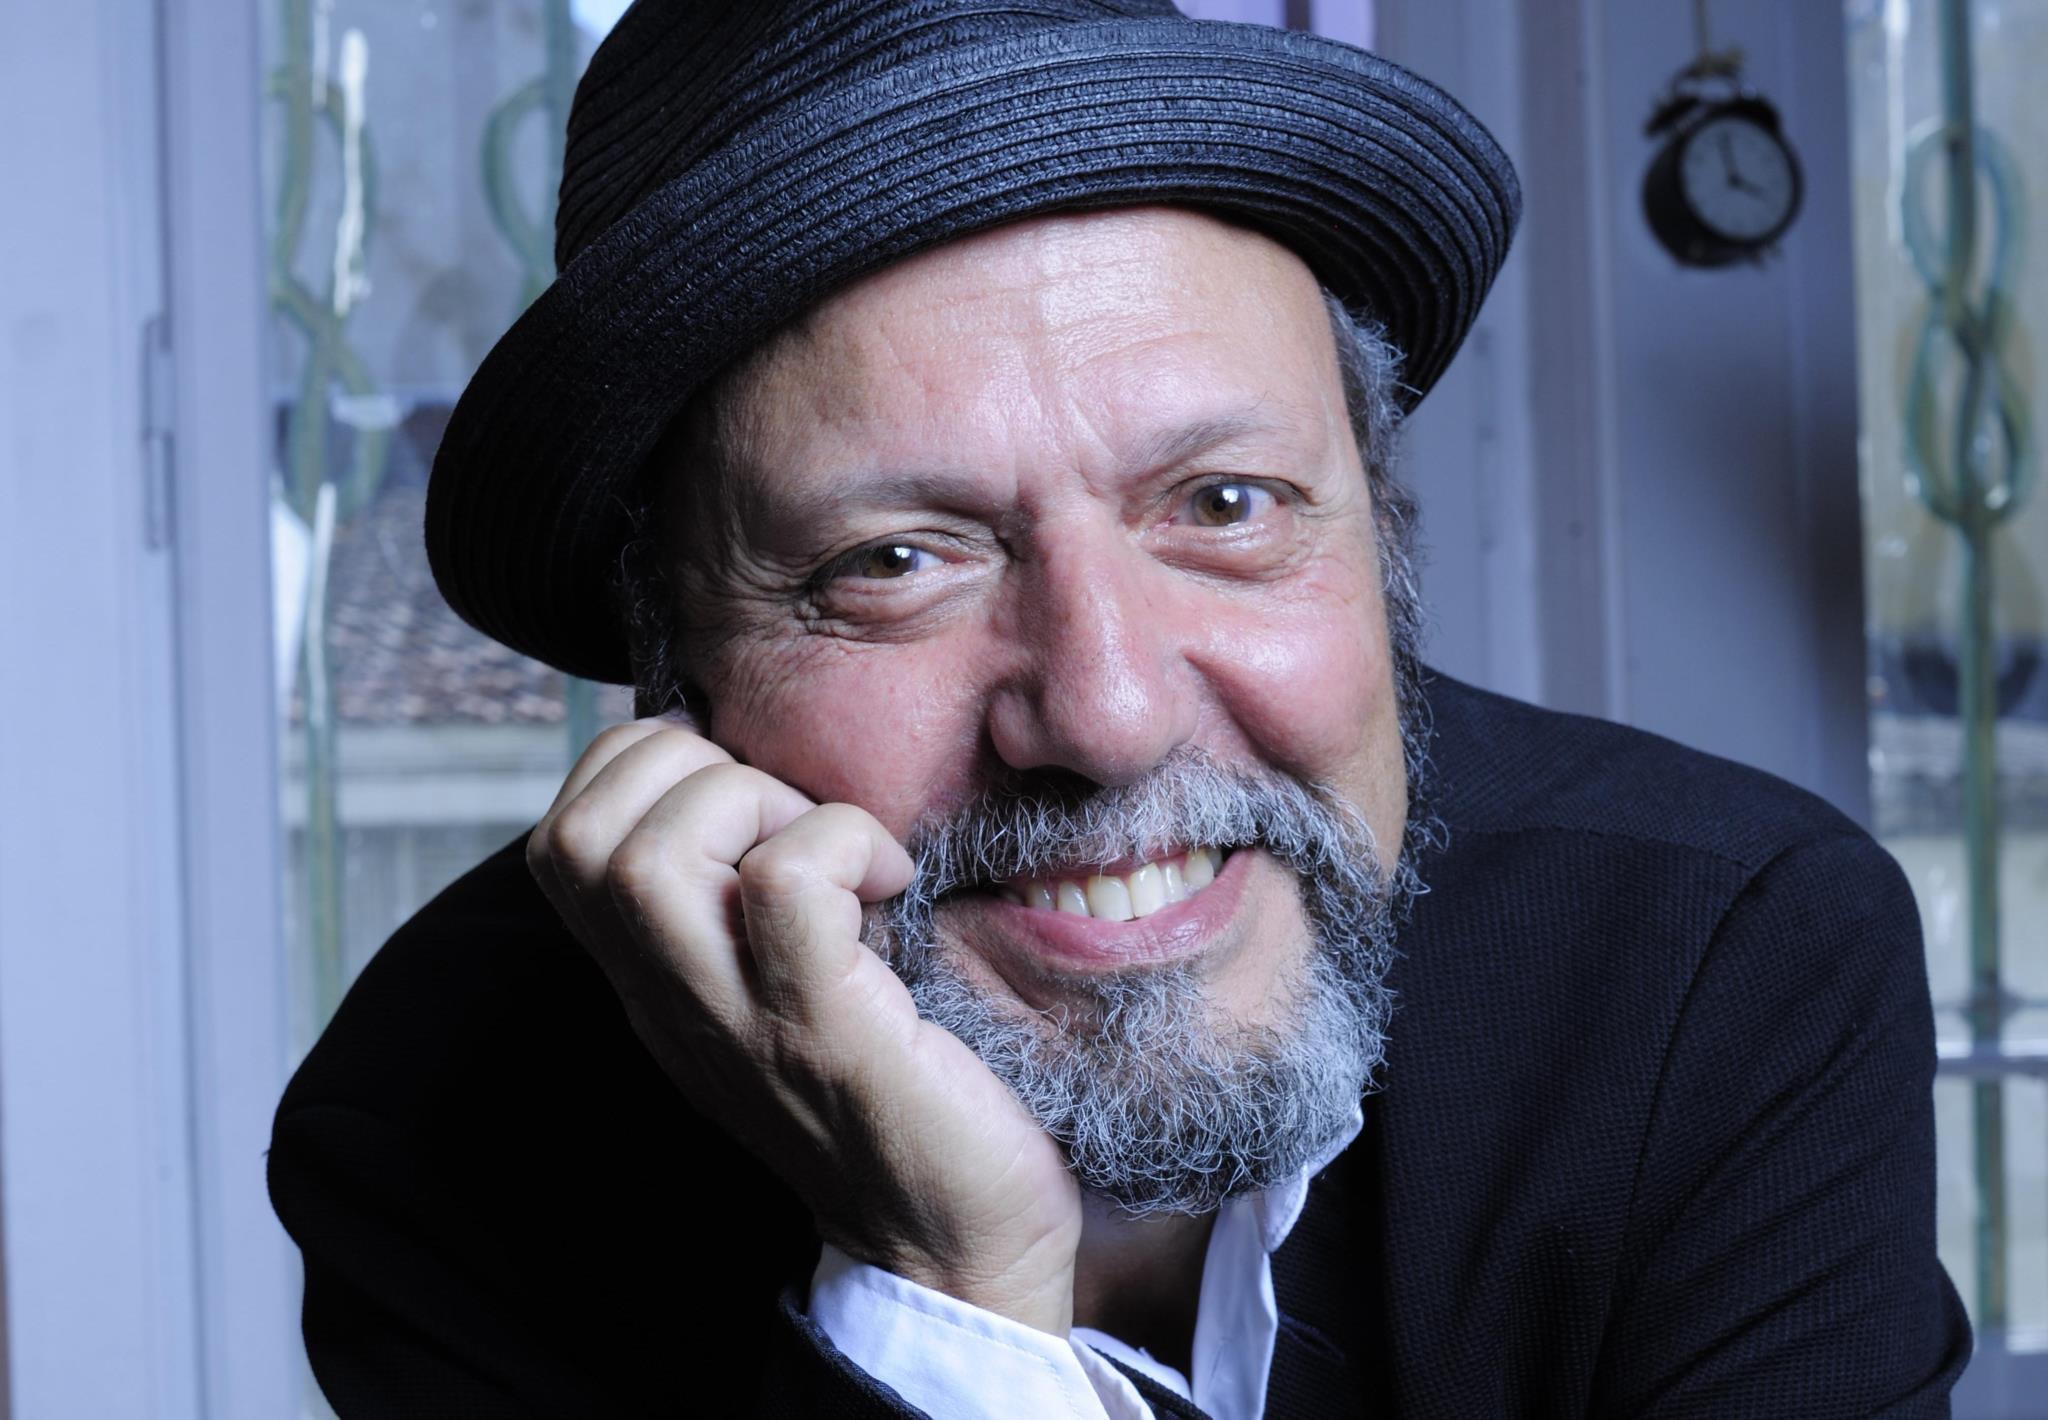 PÚBLICO - José Pereira da Costa